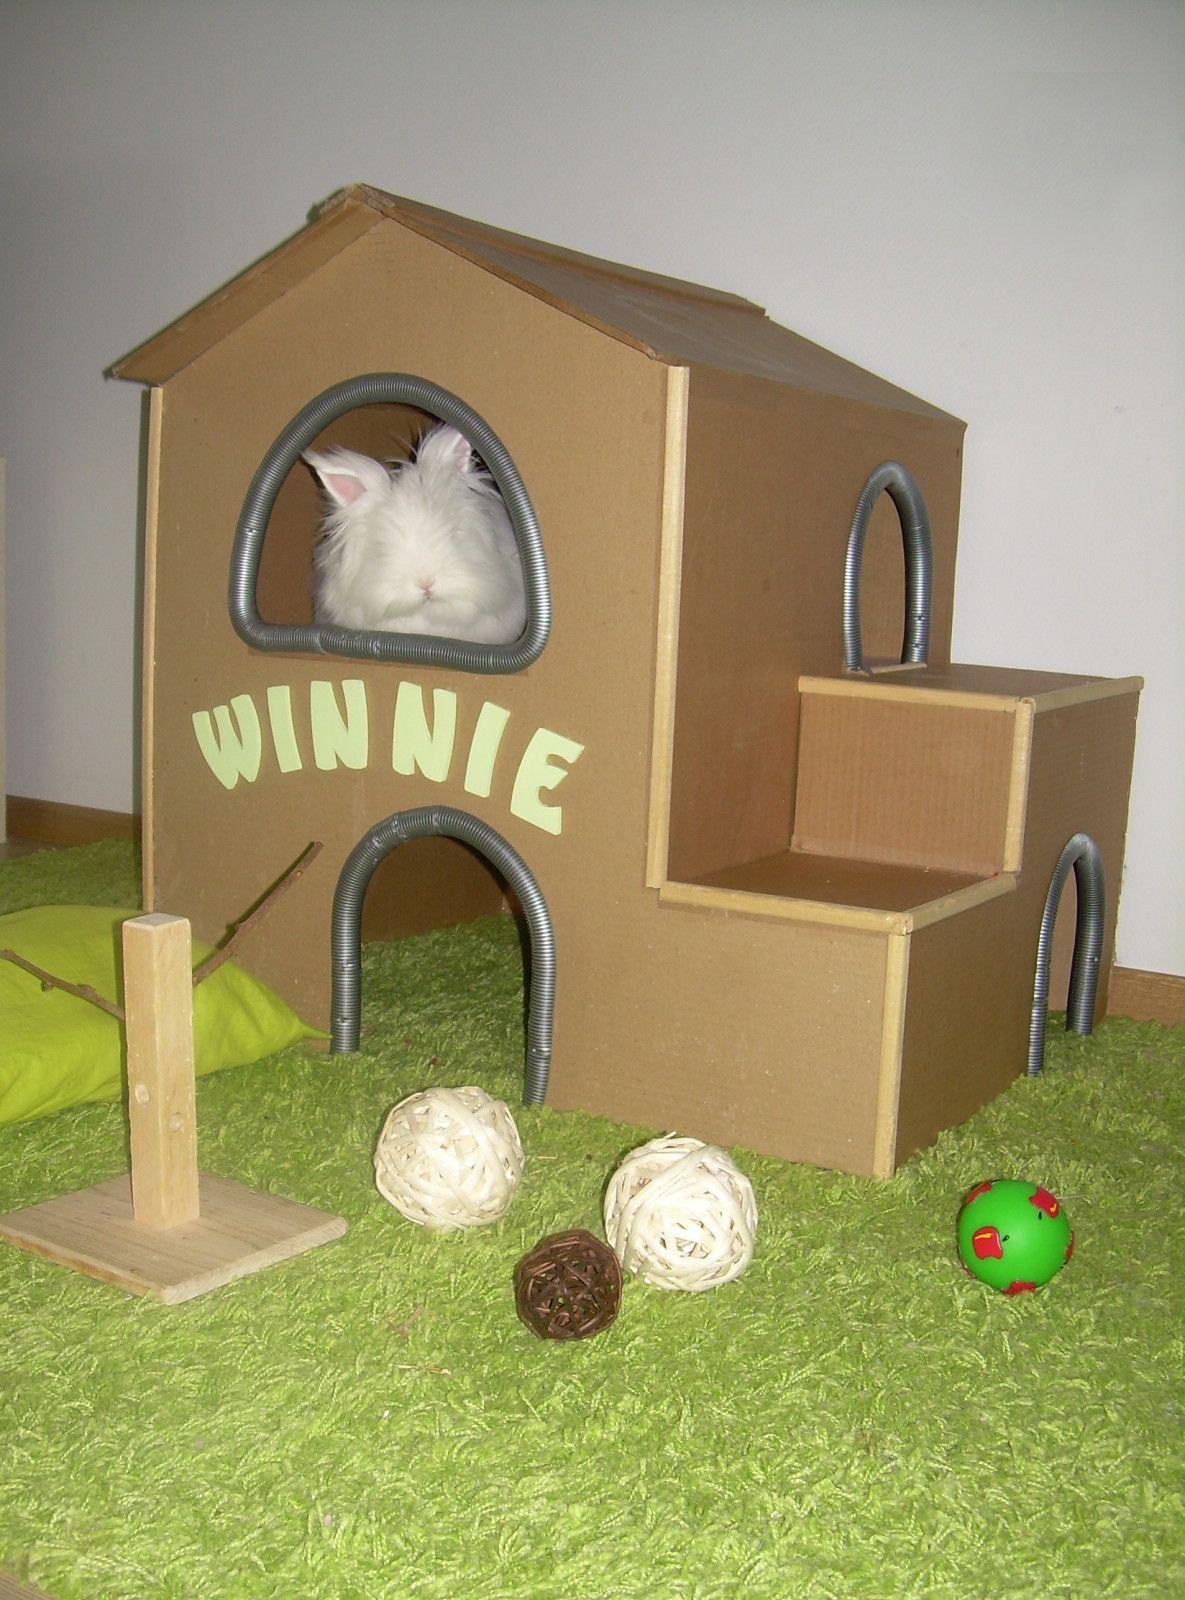 tuto de la cabane lapin de winnie diy rabbit 39 s cardboard shack all of the bunny things. Black Bedroom Furniture Sets. Home Design Ideas